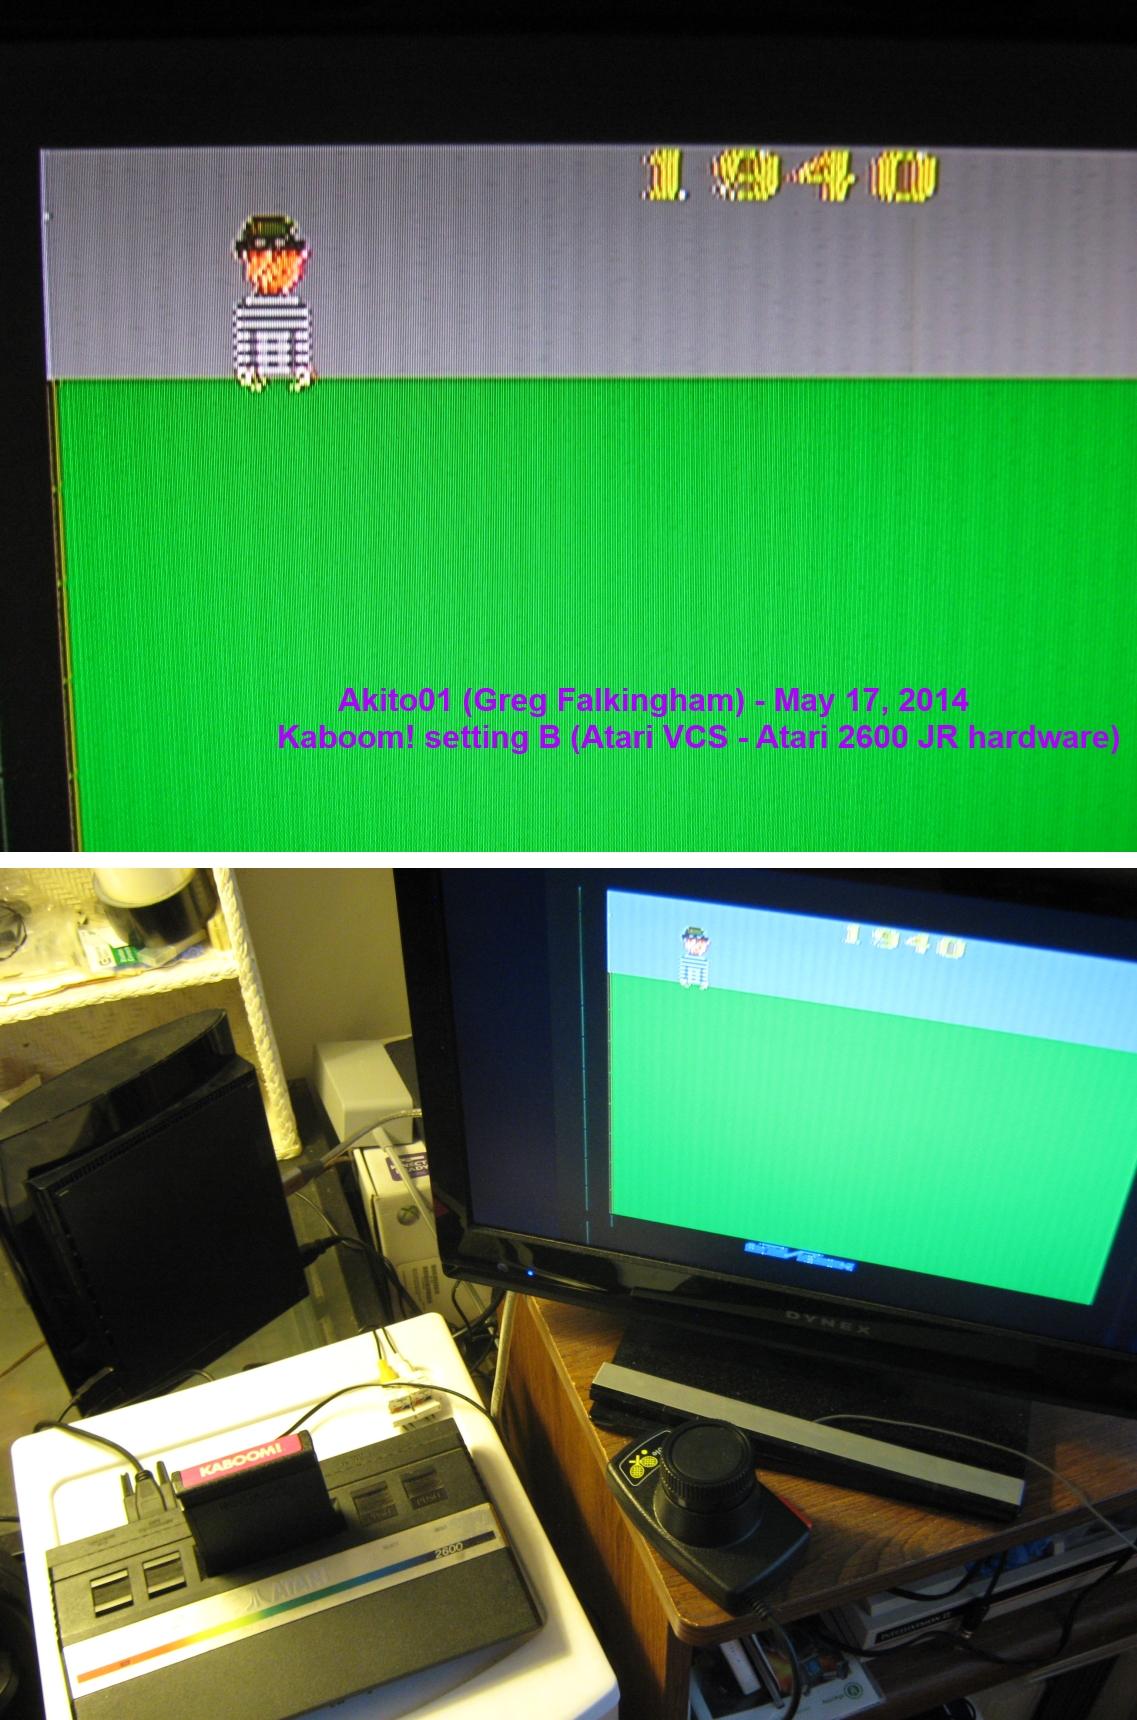 Akito01: Kaboom! (Atari 2600 Novice/B) 1,940 points on 2014-05-17 18:33:01